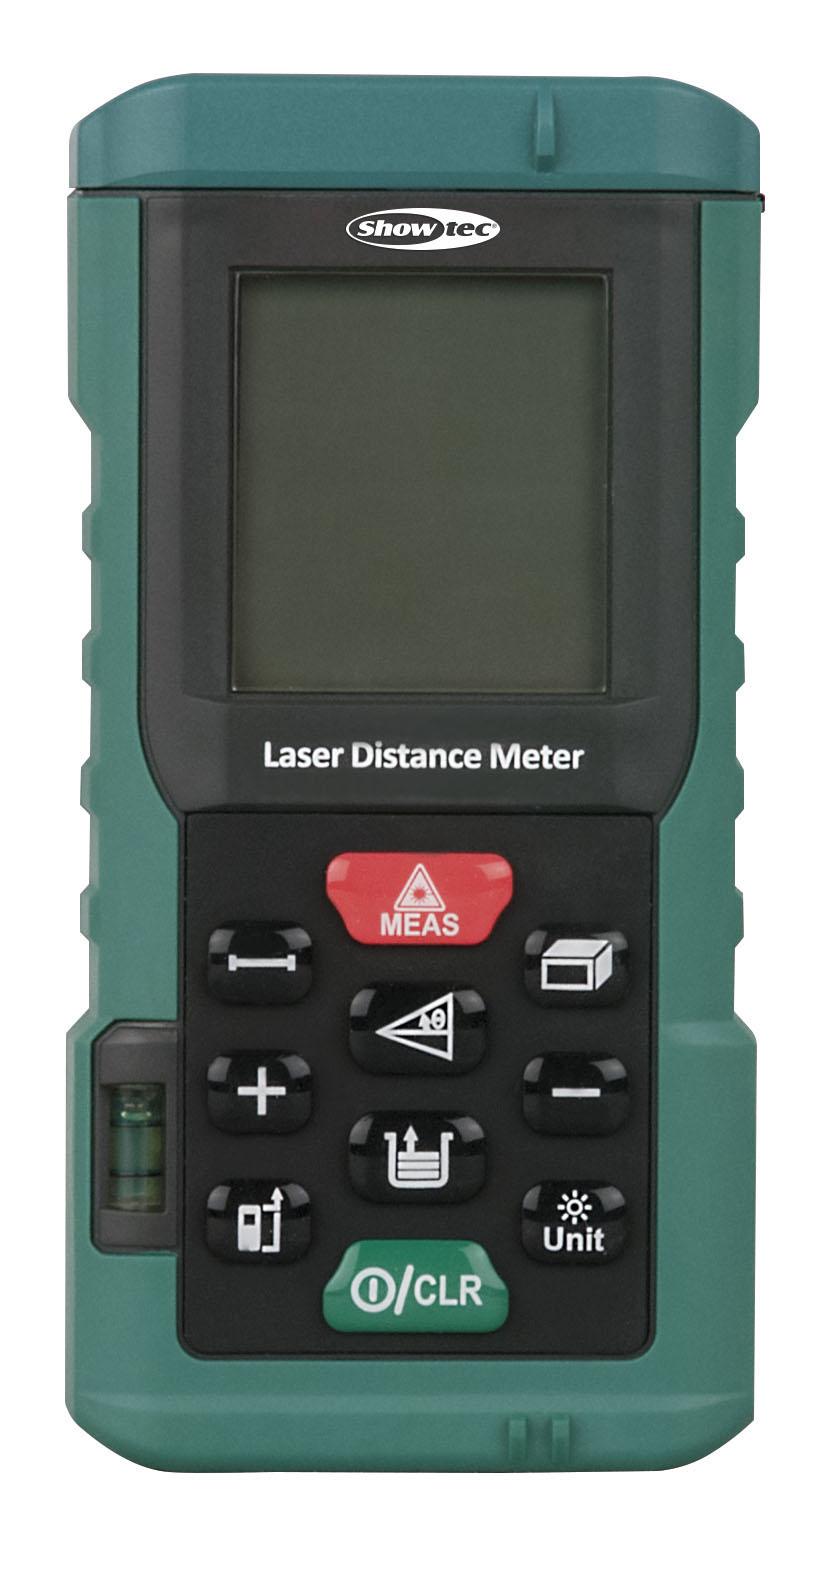 Showgear Laser Distance Meter